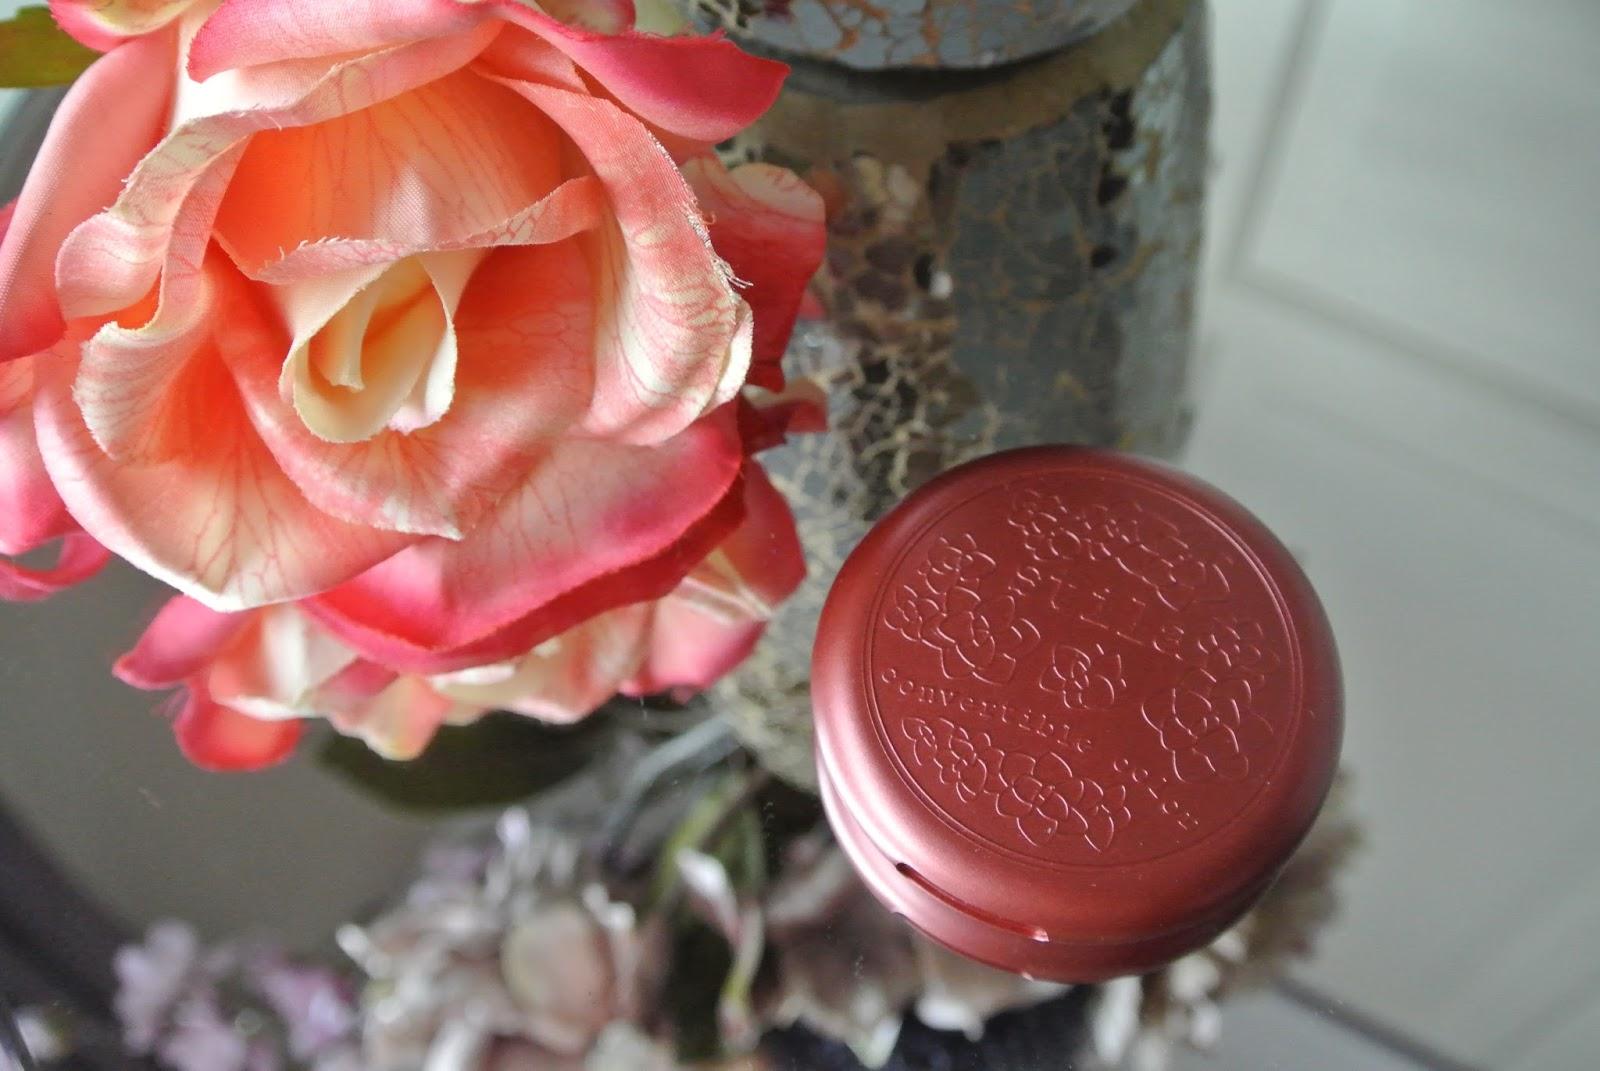 Stila Makeup HD Beauty Balm Eyeliner Mascara Lash Primer Stay All Day Vinyl LipGloss Convertible Colour